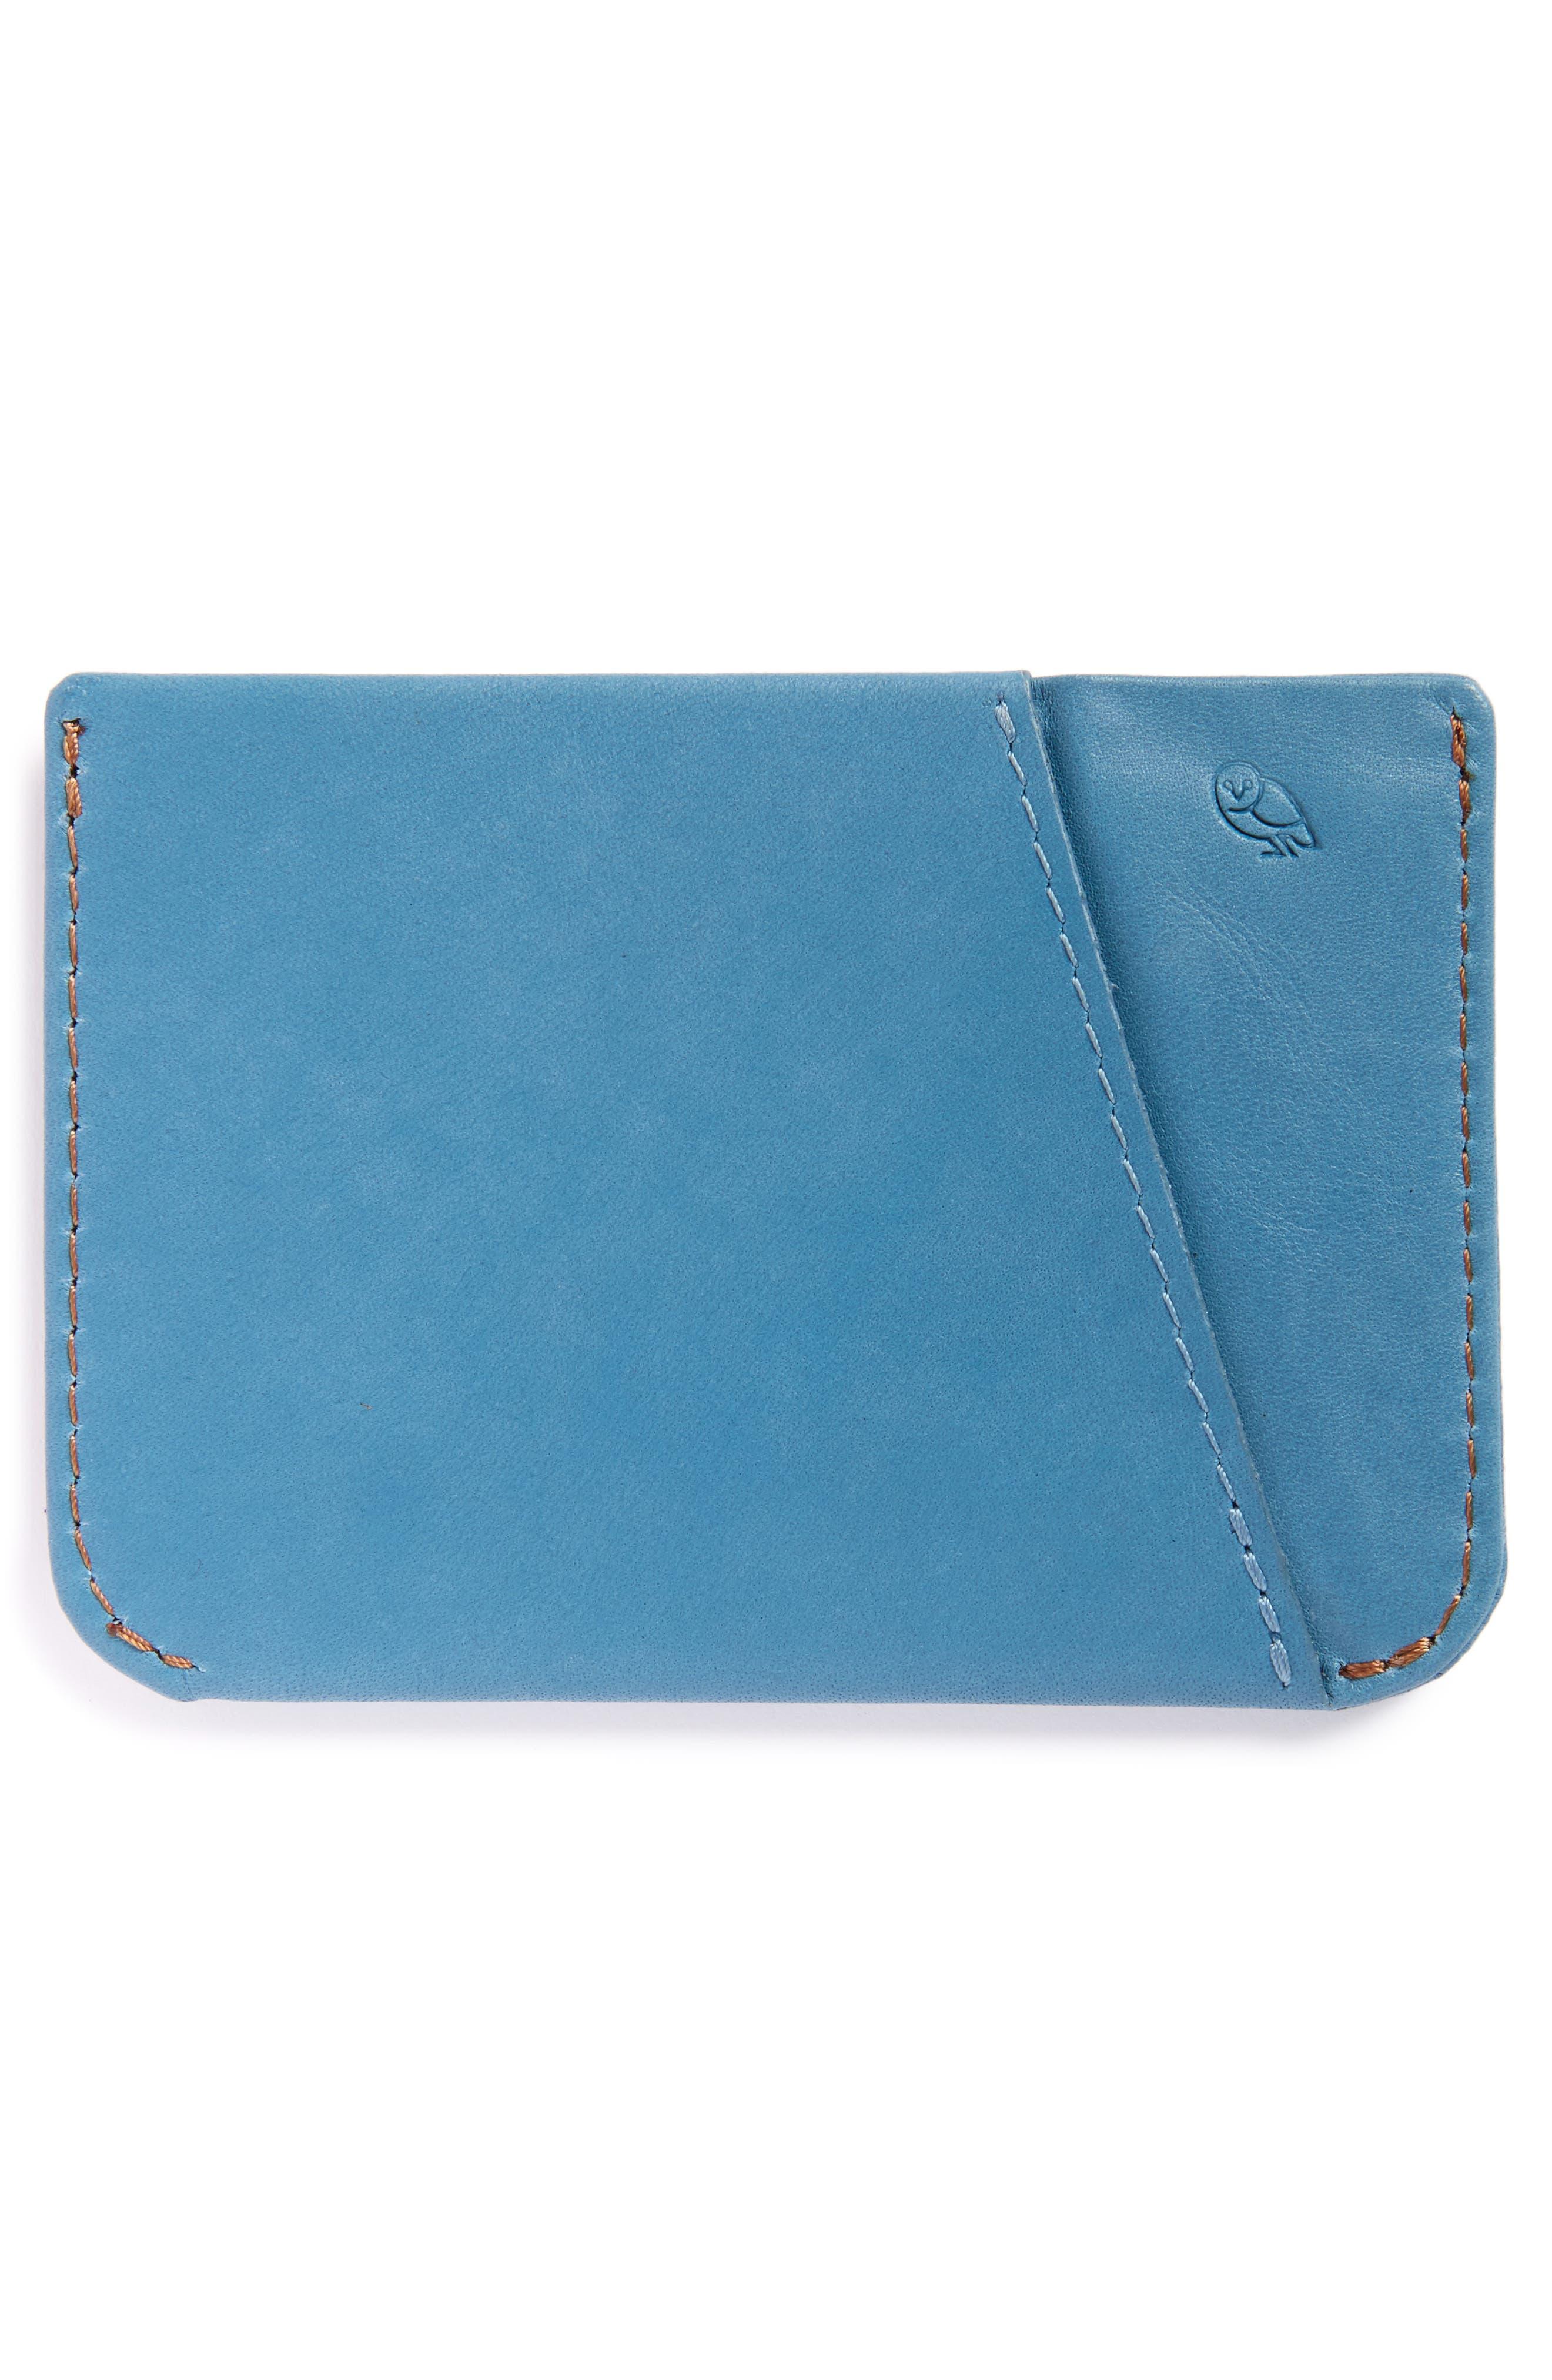 Micro Sleeve Card Case,                             Alternate thumbnail 2, color,                             Arctic Blue